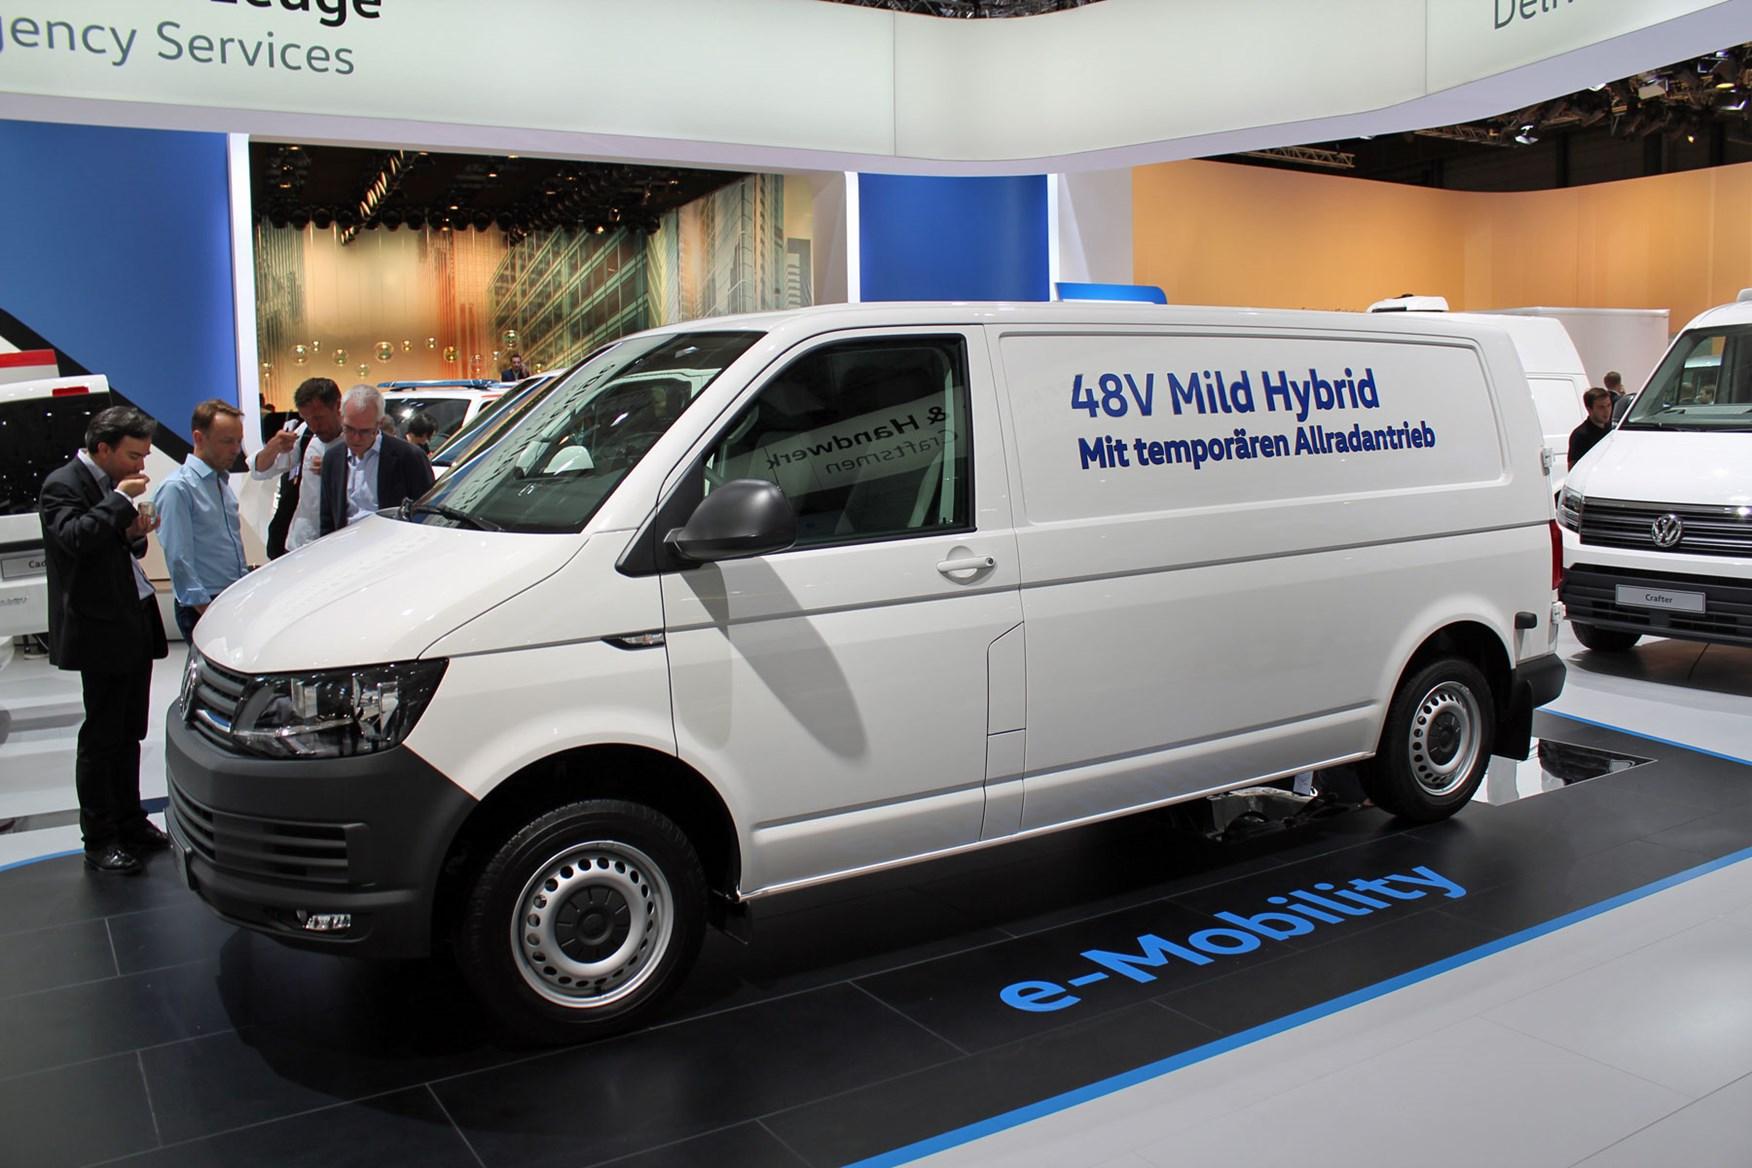 Vw Transporter Mild Hybrid Sel Electric Conversion At The Iaa 2018 Vauxhall Combo Van